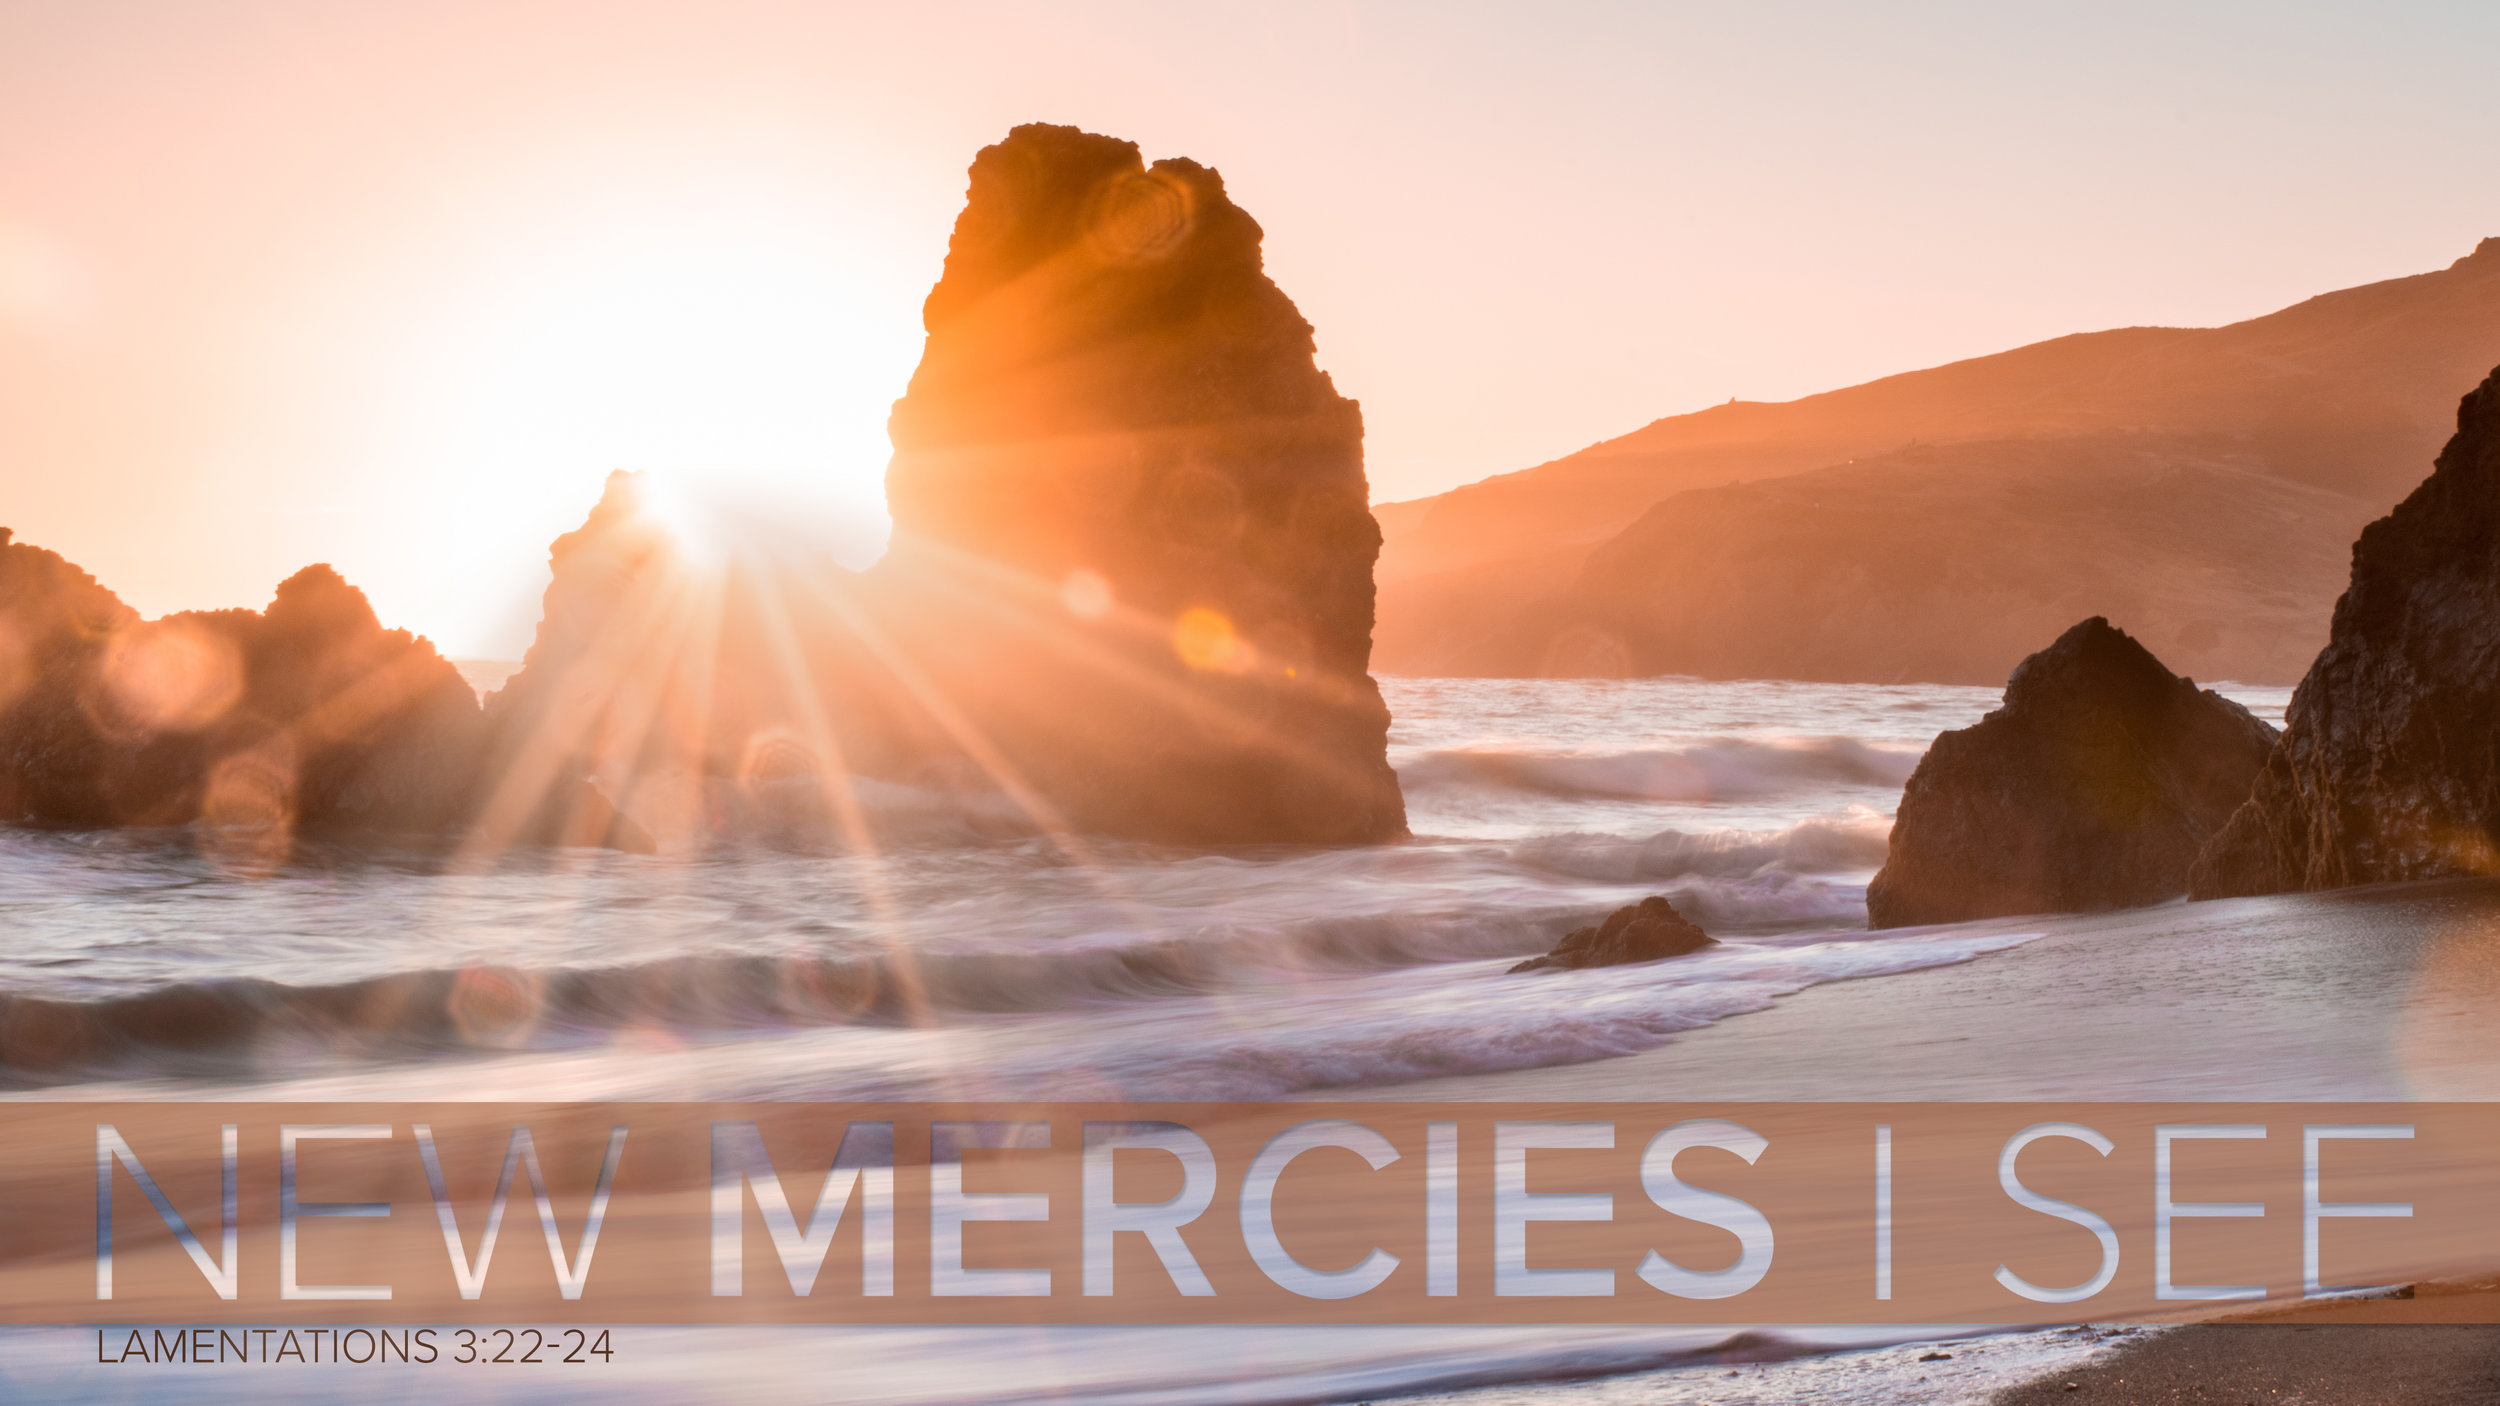 New Mercies I See.jpg